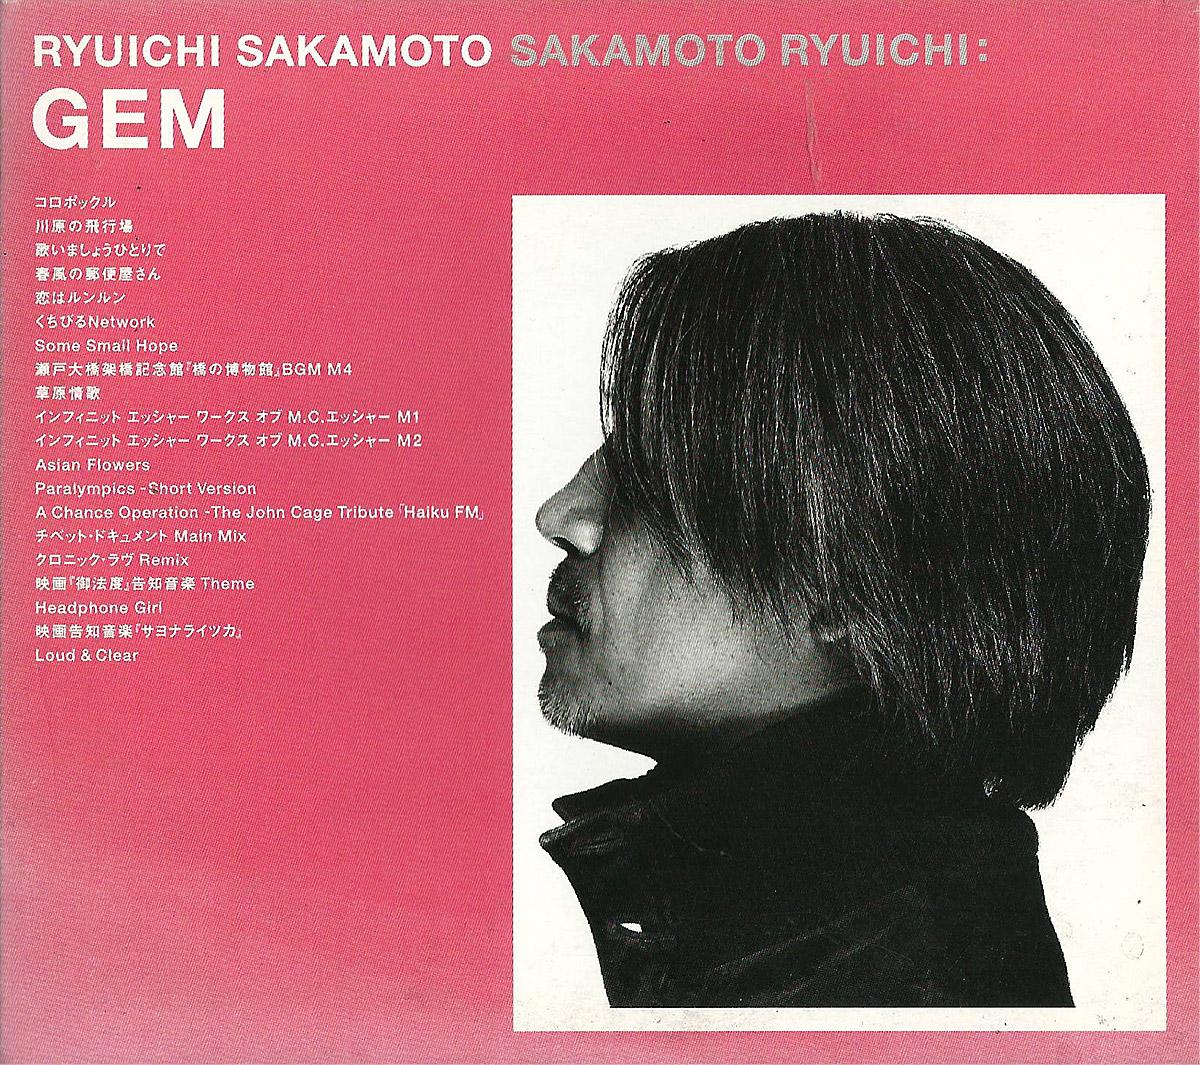 Ryuichi Sakamoto -GEM front